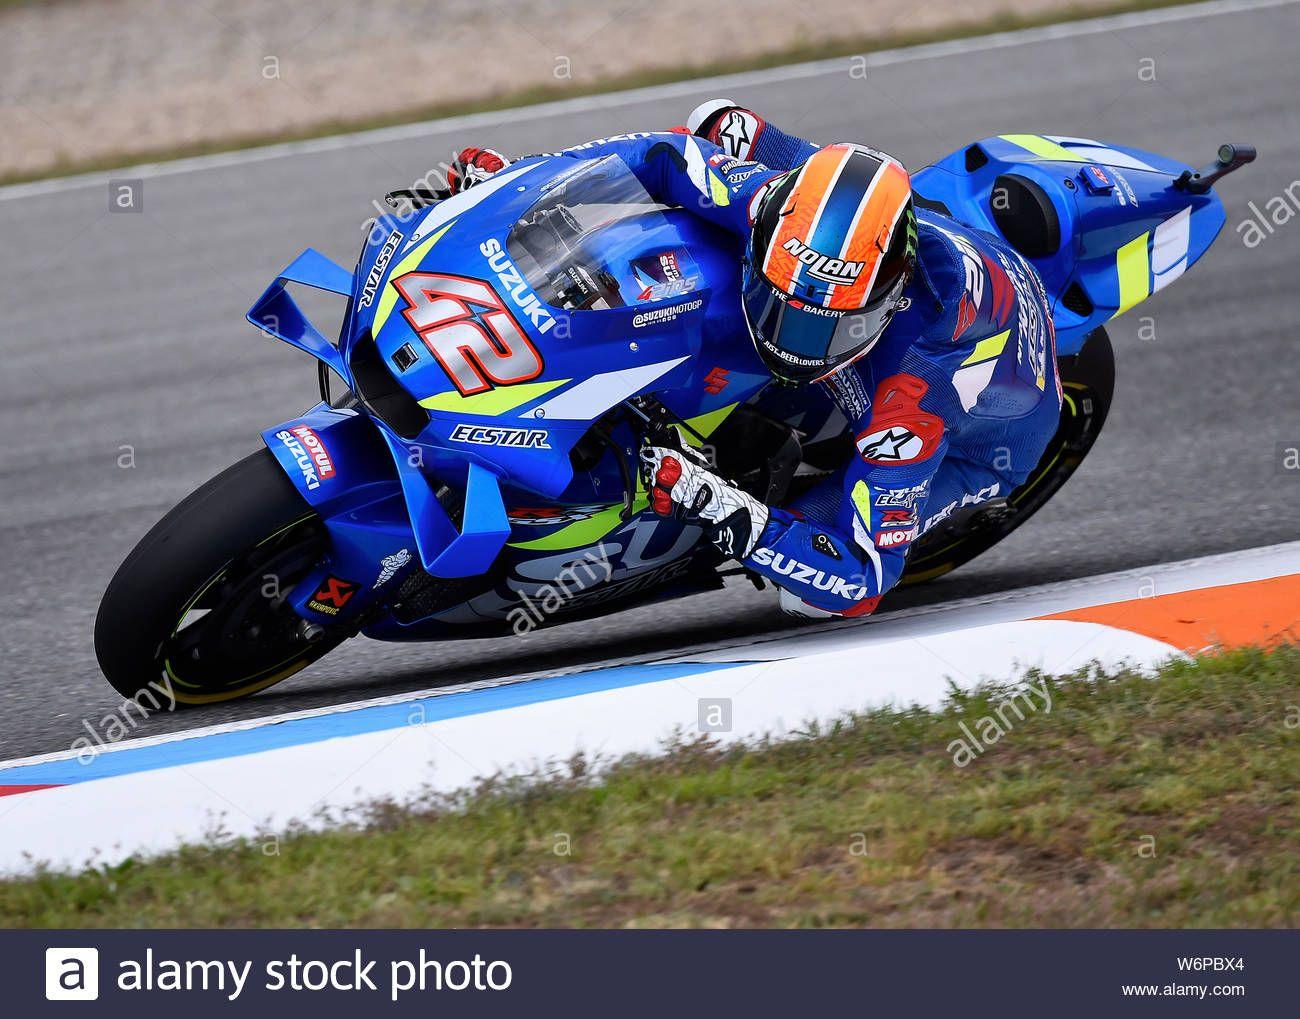 Download This Stock Image Brno Czech Republic 02nd Aug 2019 Spanish Motogp Rider Alex Rins During The Czech Grand Prix Moto Gp Trai Motogp Brno Grand Prix